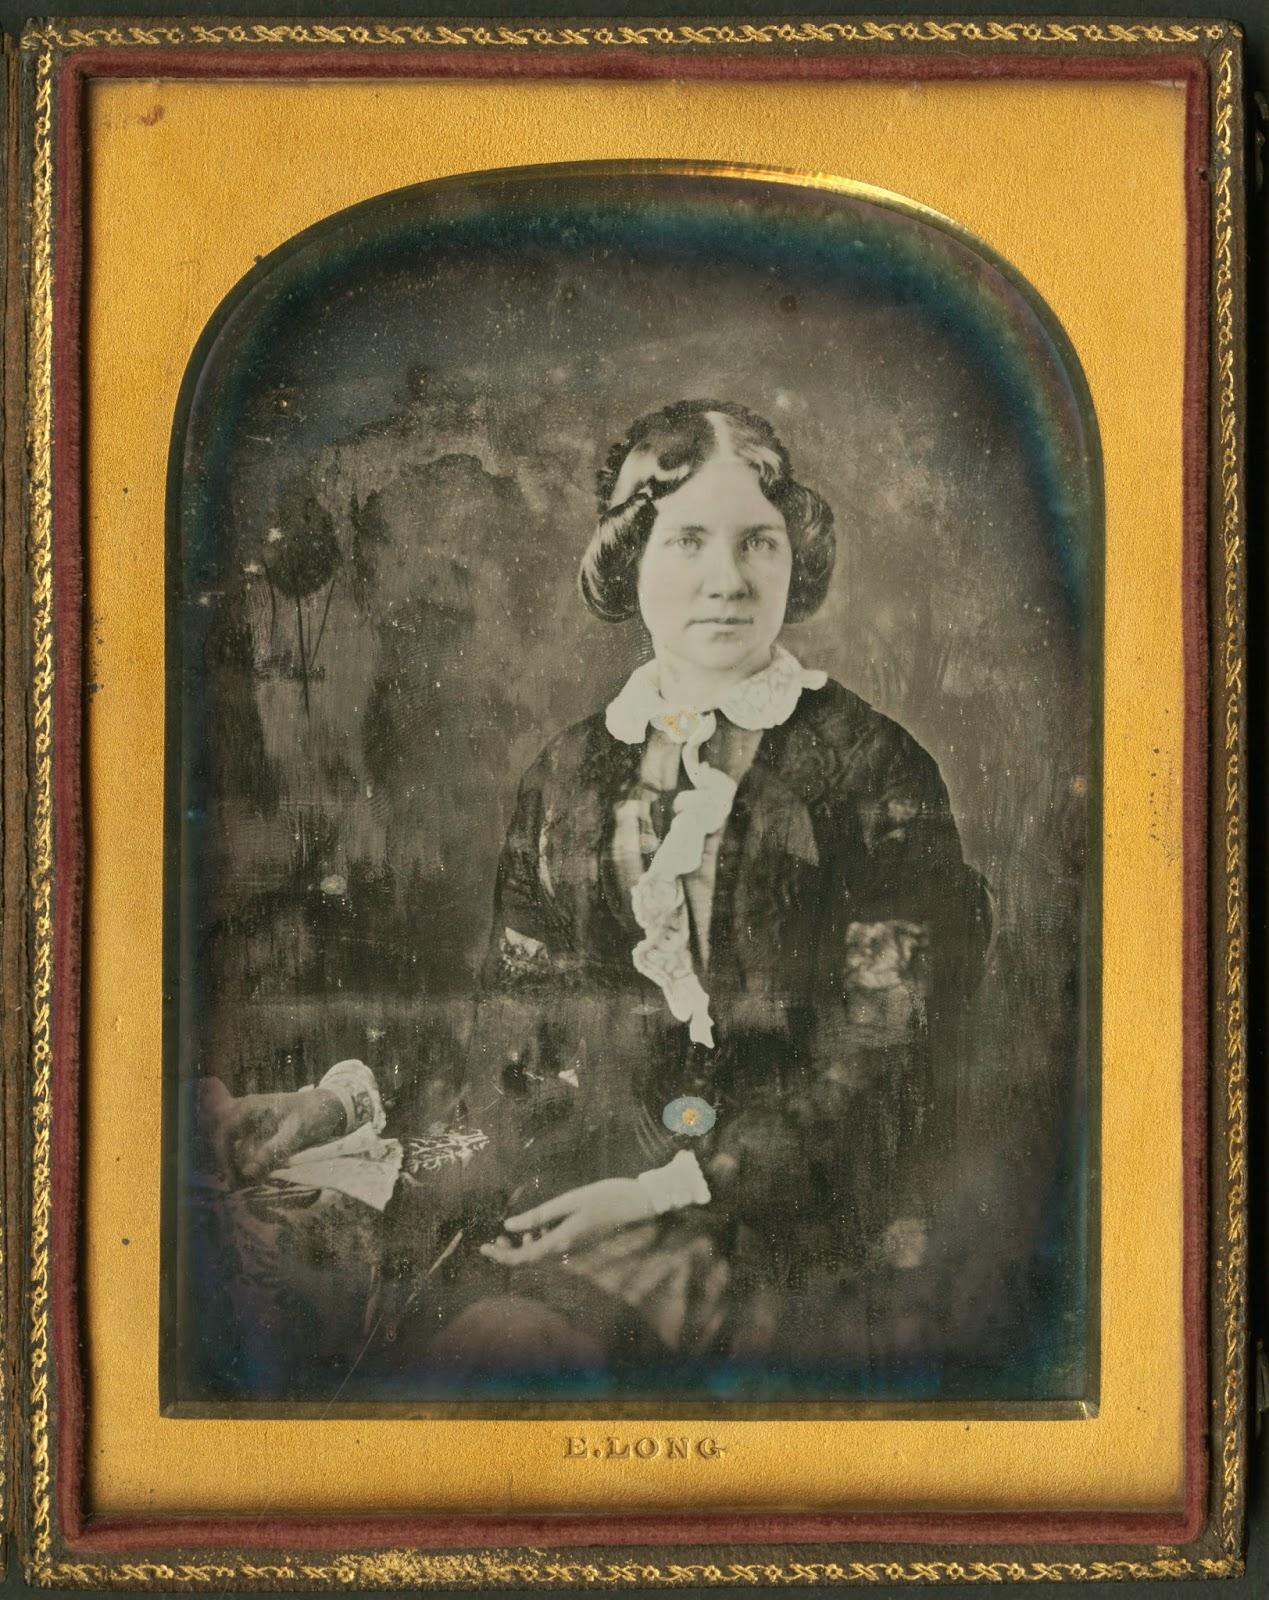 A daguerrotype of Jenny Lind.